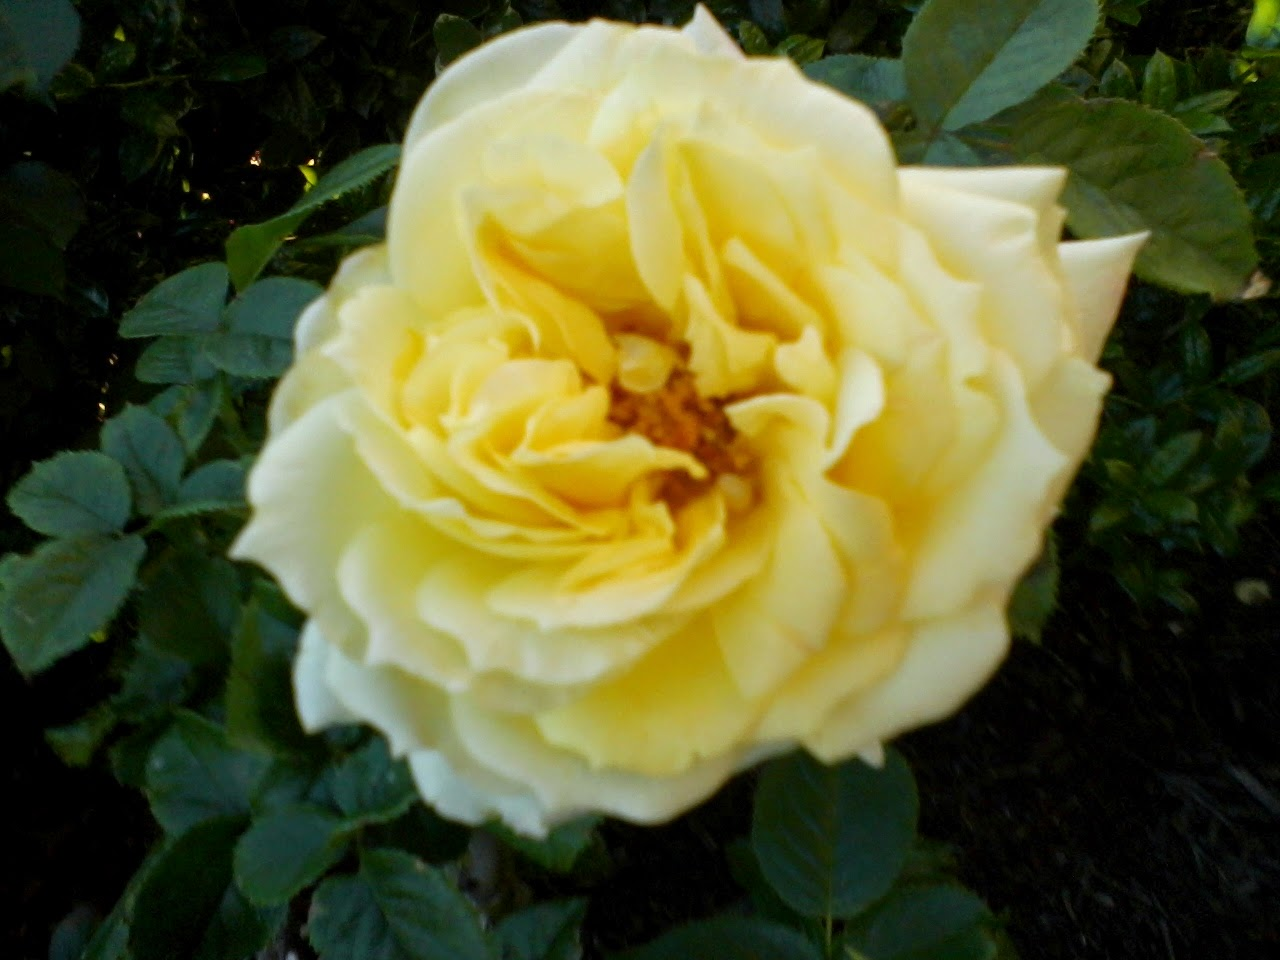 Gardening 2014 - 0409191003.jpg